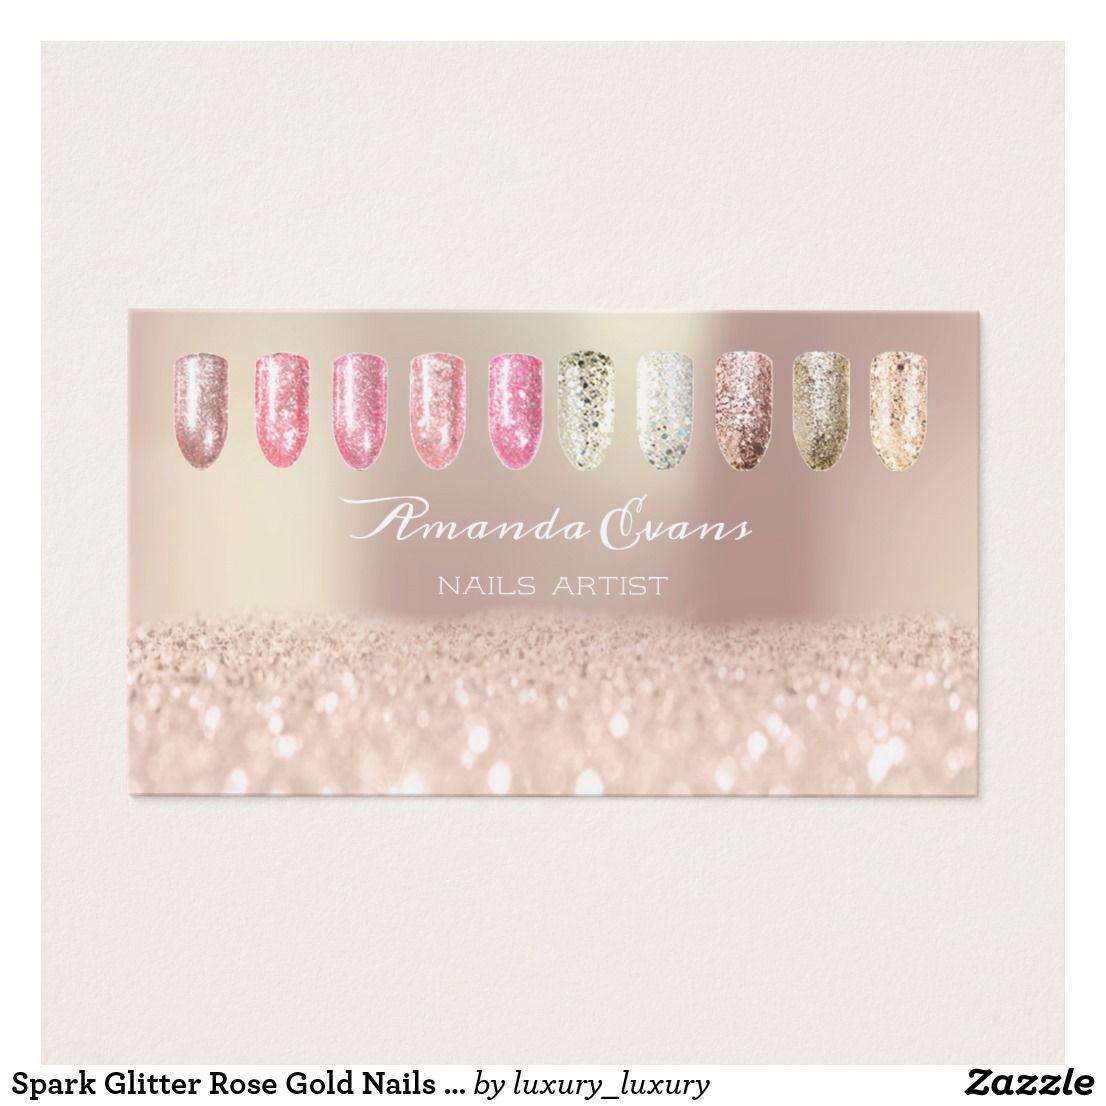 Spark Glitter Rose Gold Nails Artist Appointment Zazzle Com